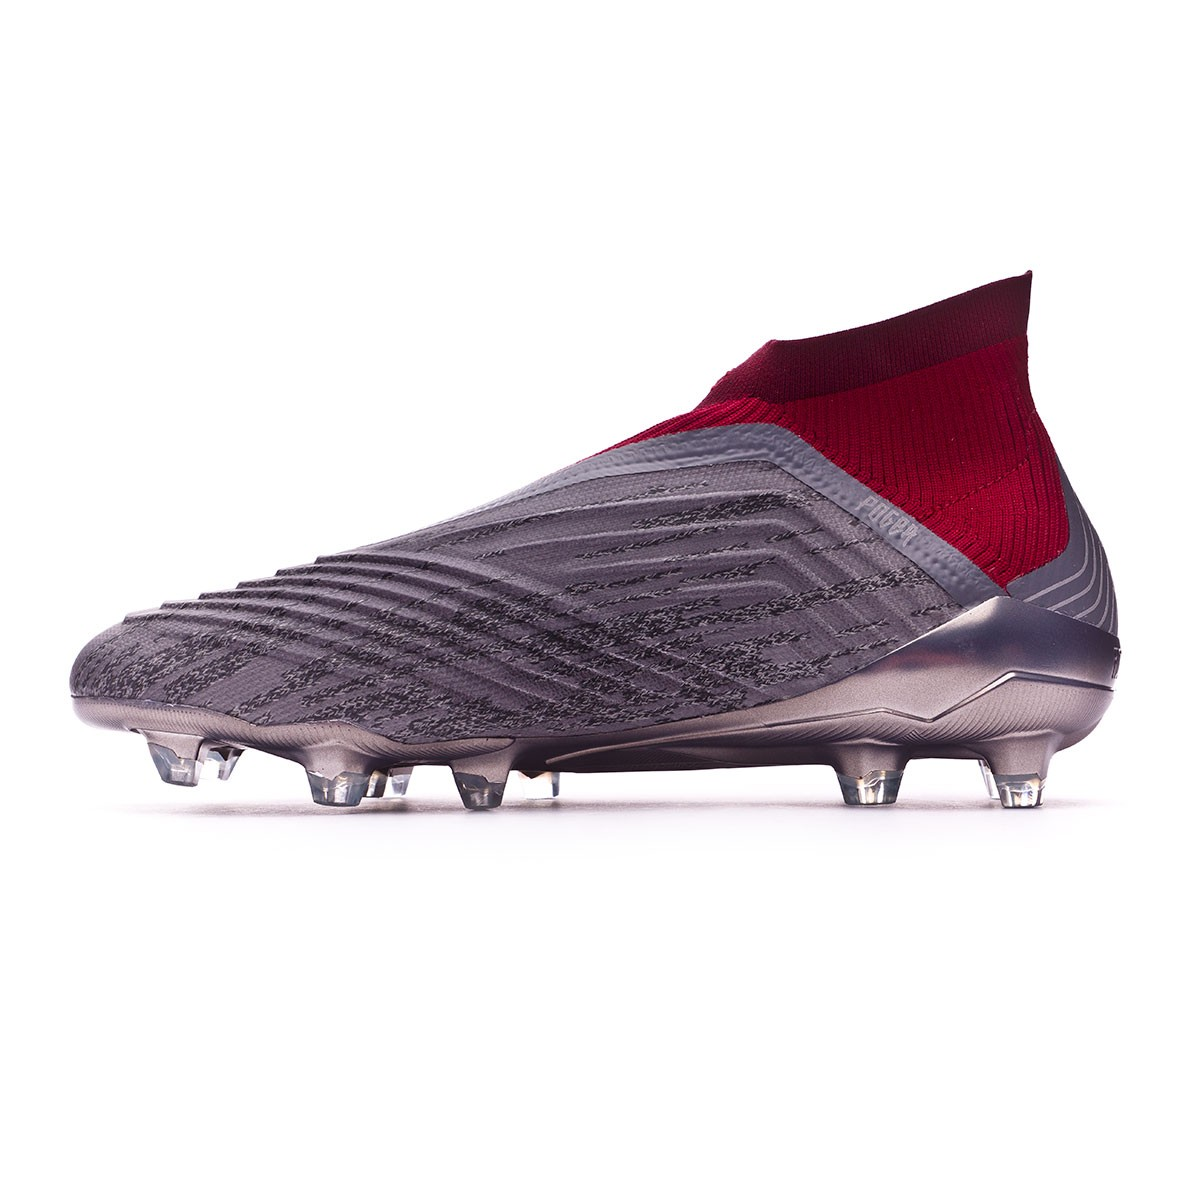 80f34f1f0 Football Boots adidas PP Predator 18+ FG Metallic-Burgundy - Tienda de  fútbol Fútbol Emotion